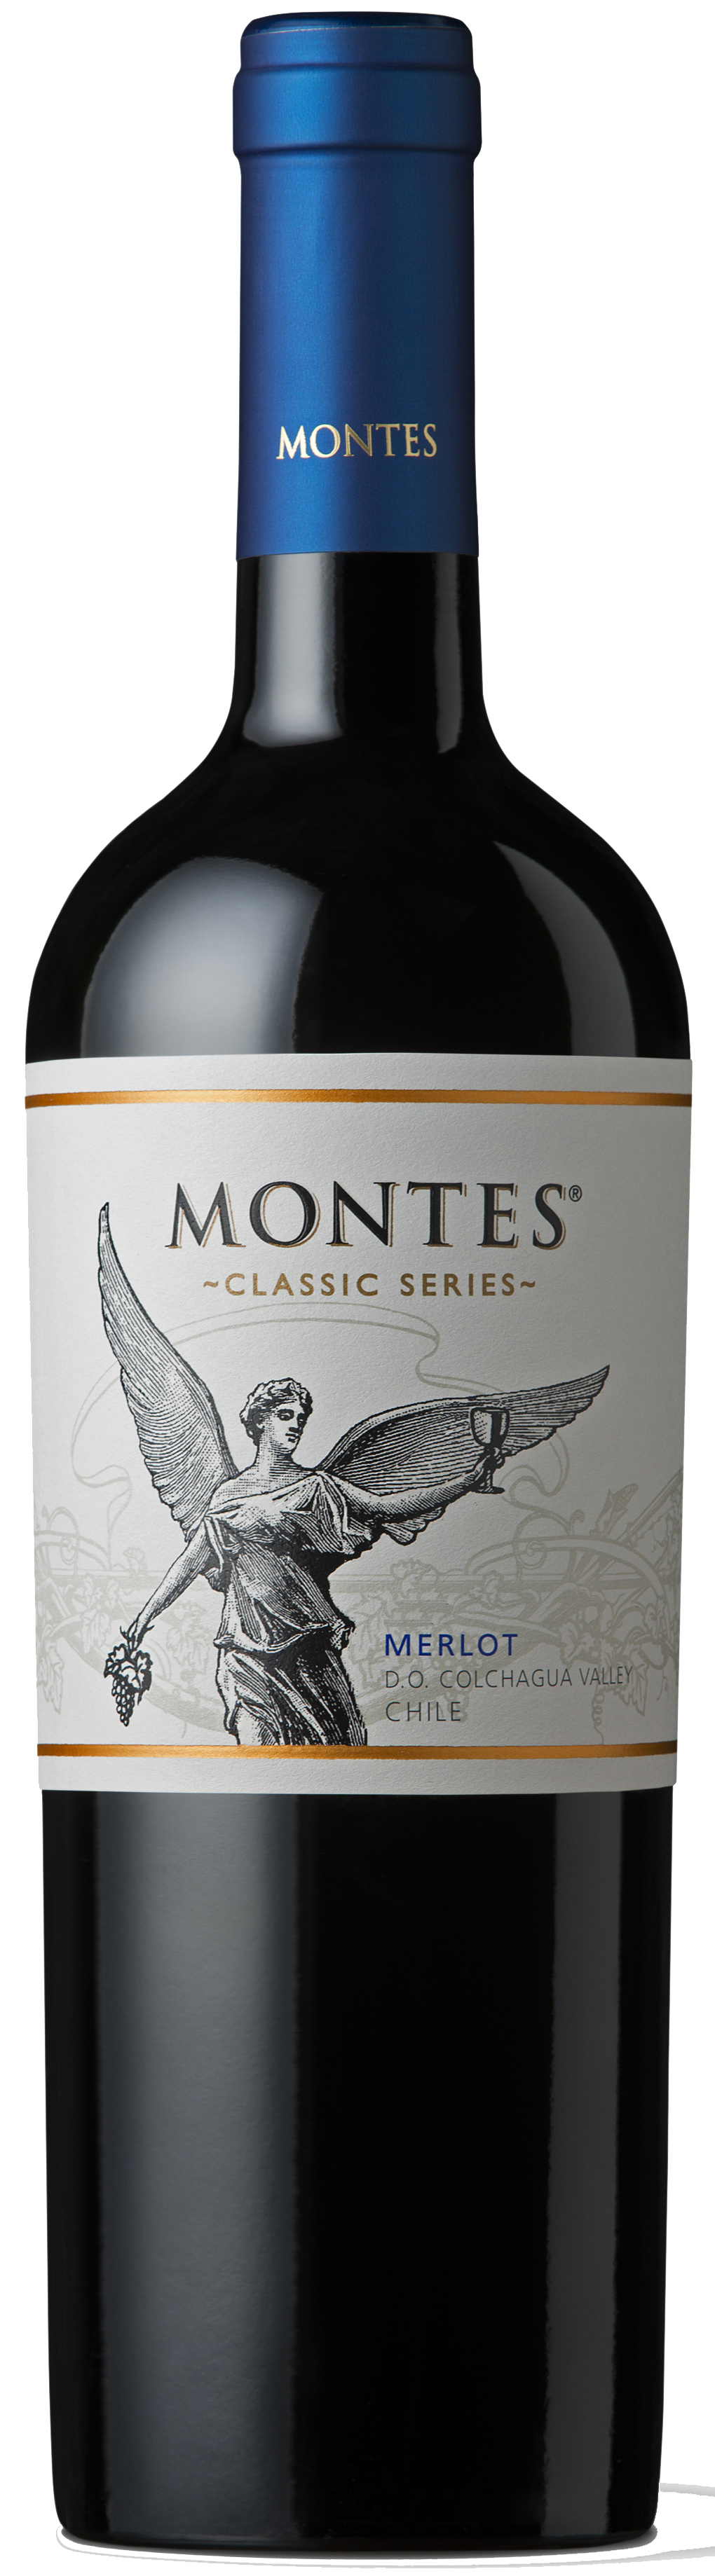 Montes Classic Series, Colchagua Merlot 2017